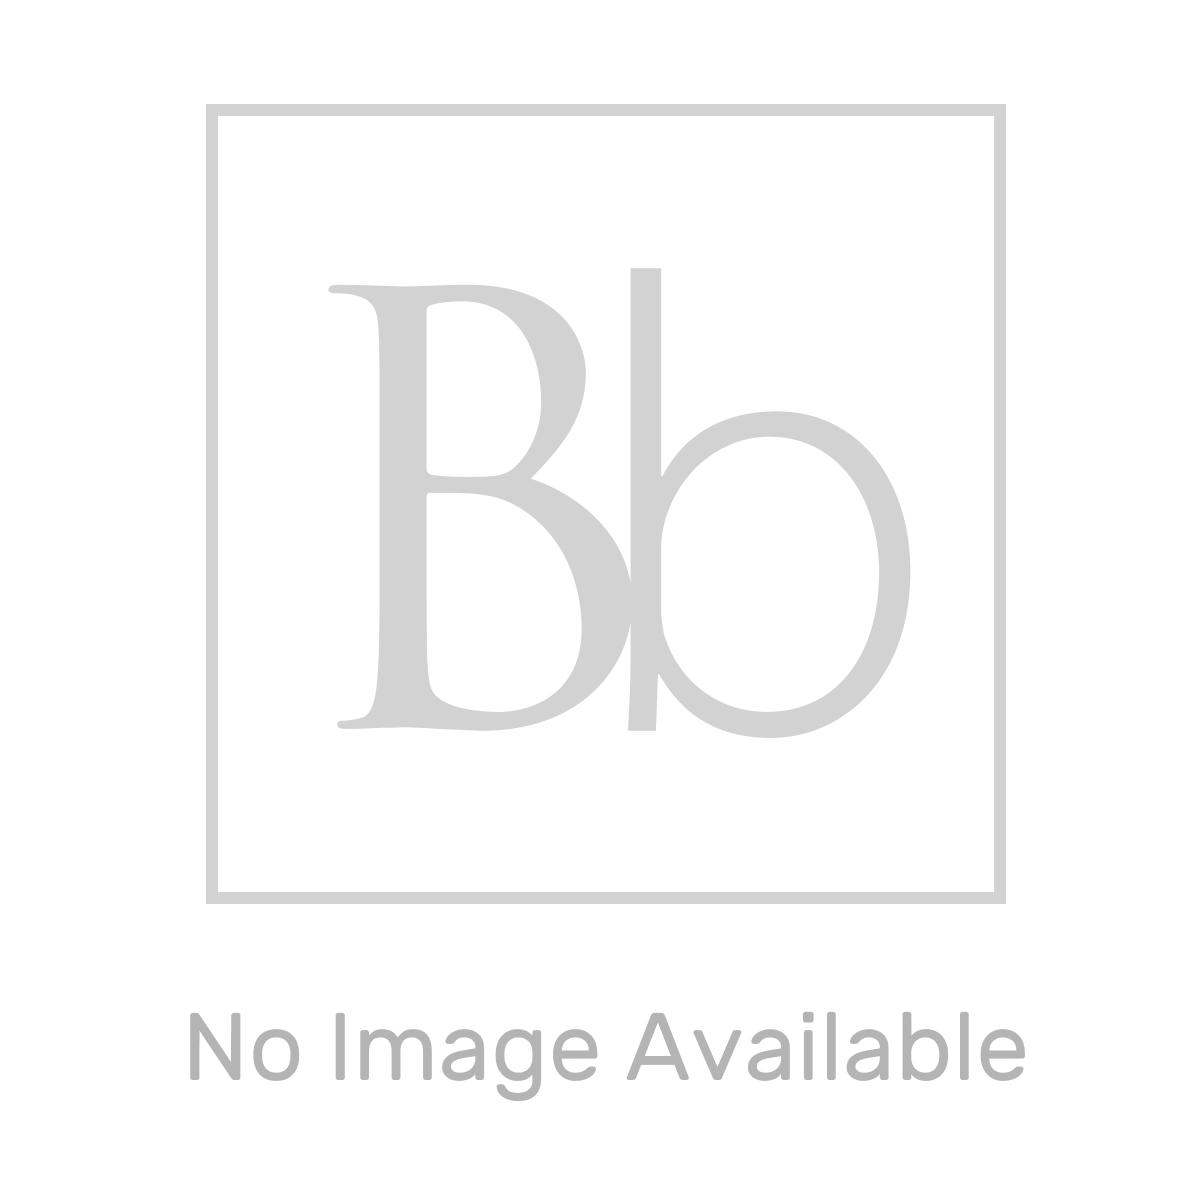 RAK Washington Black Freestanding Bath 1560mm